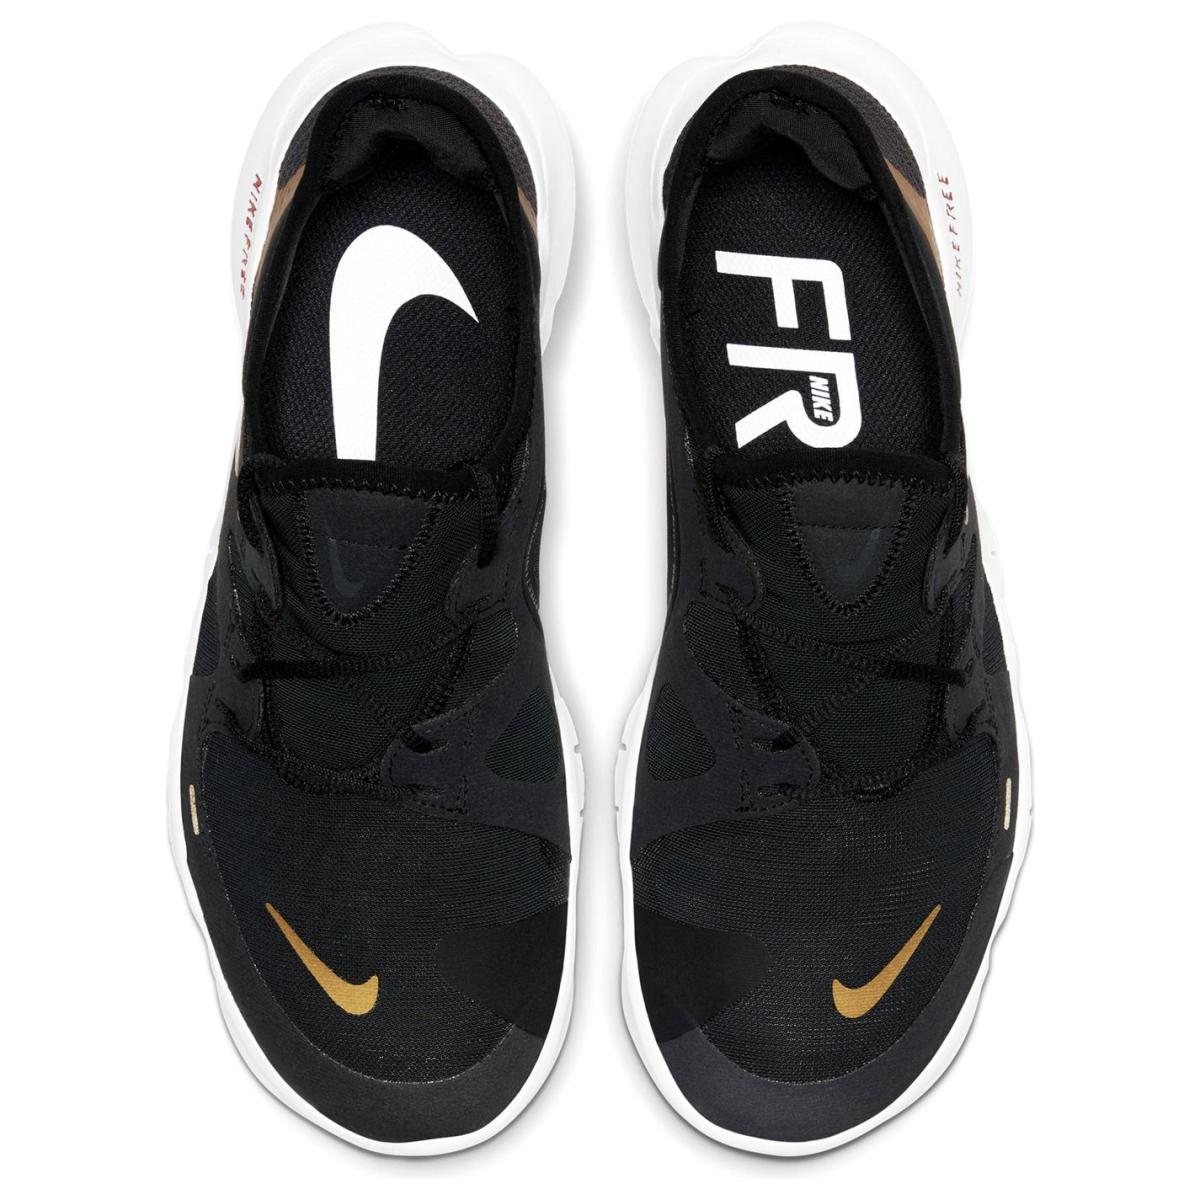 Nike-Free-Run-5-0-Turnschuhe-Damen-Sneaker-Sportschuhe-Laufschuhe-4923 Indexbild 4